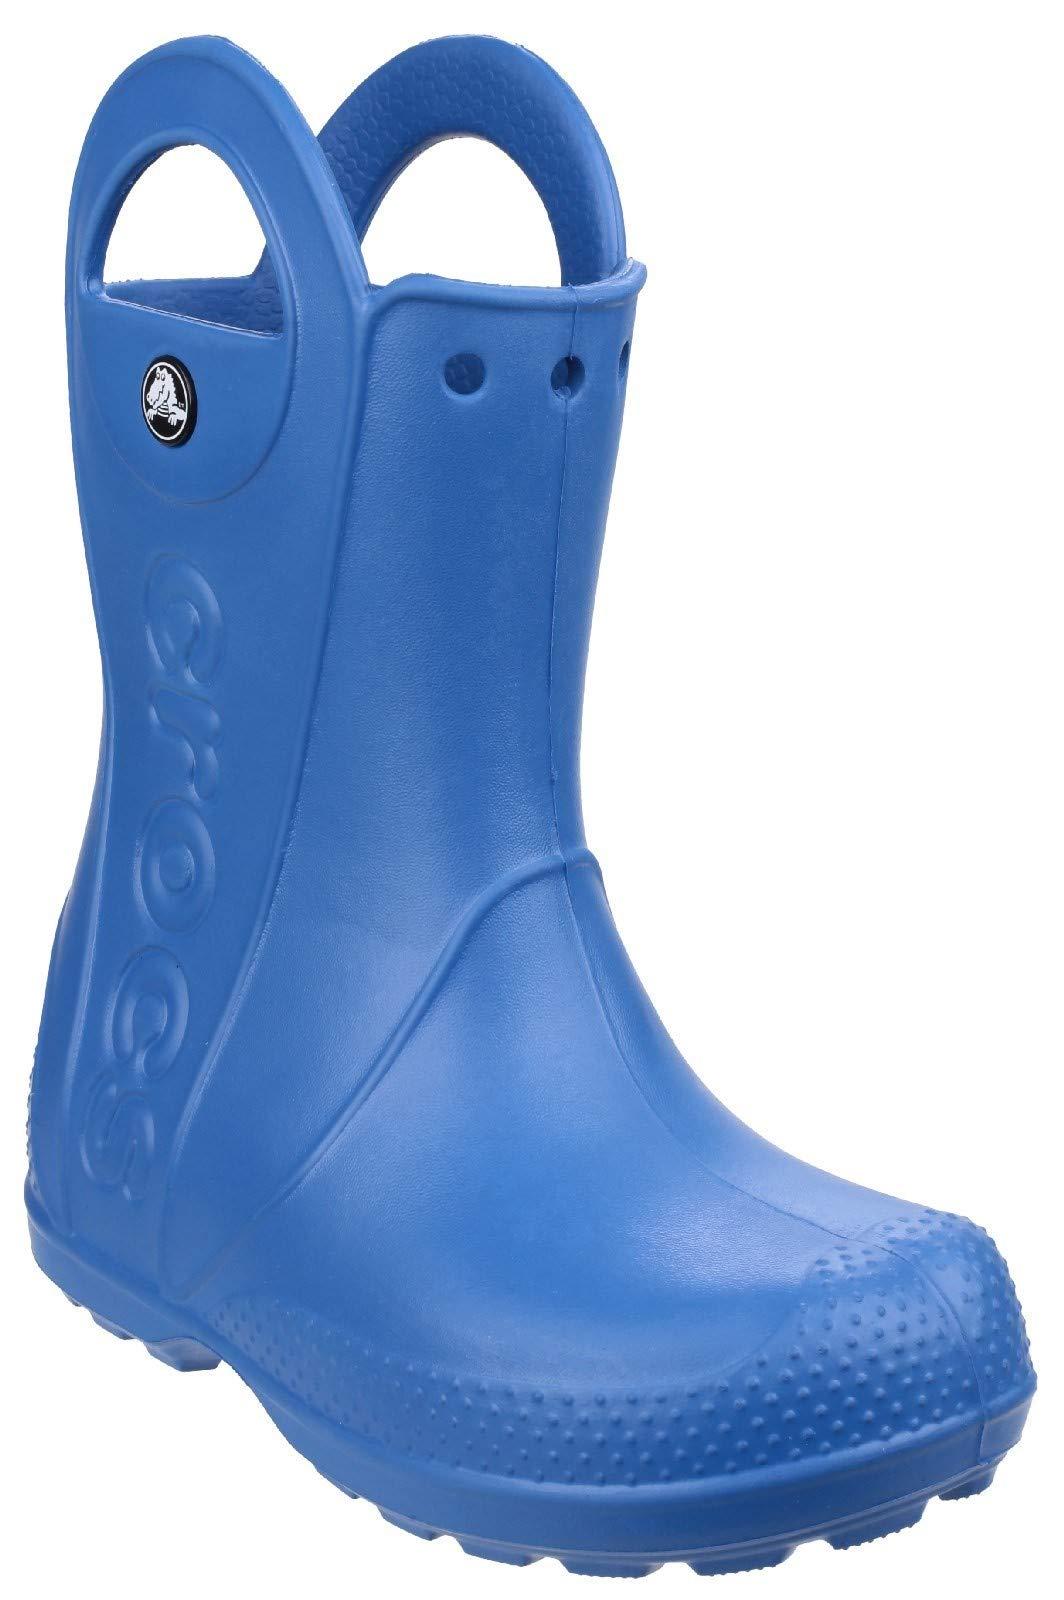 Crocs Kids' Handle It Rain Boot - 12803 Sea Blue